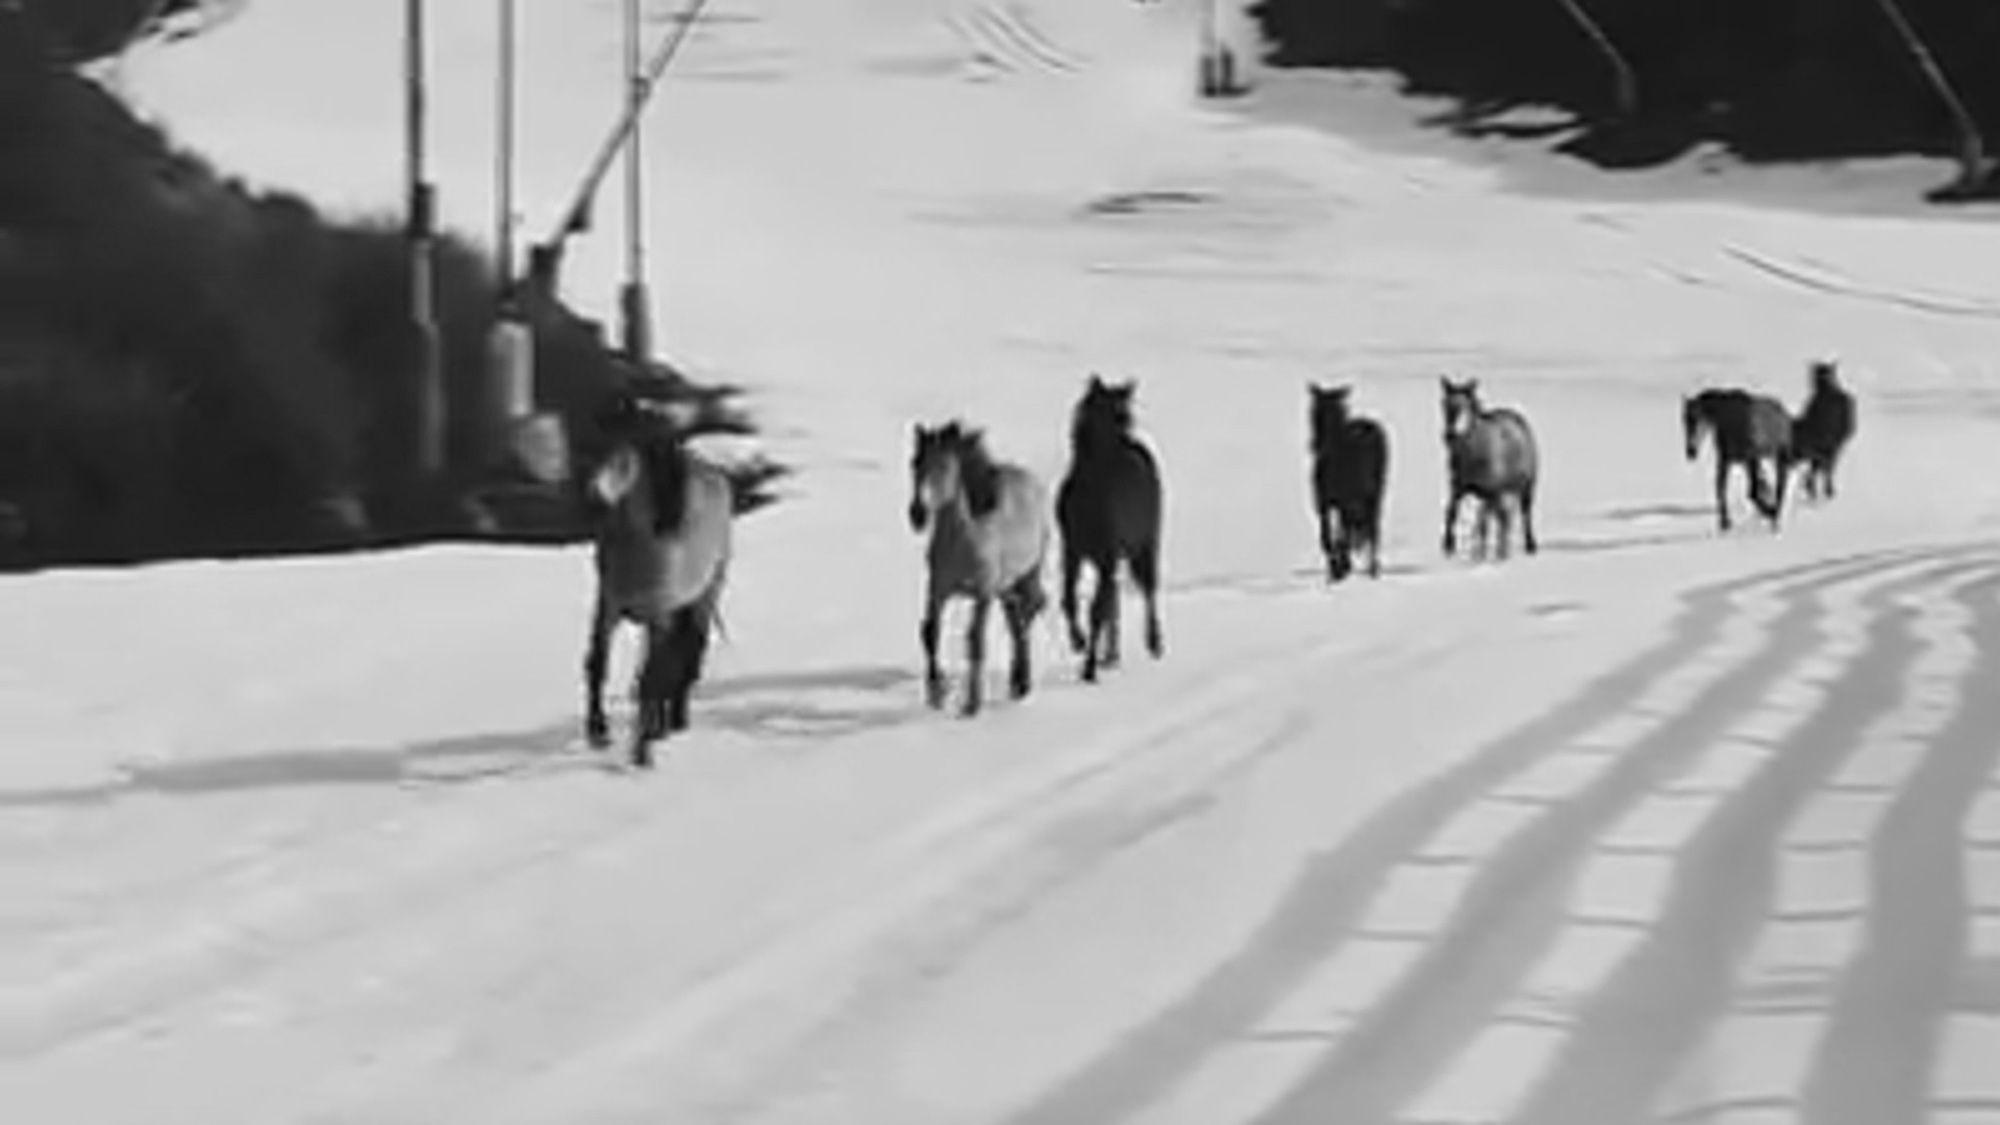 Wild Horses Run Around Pistes At Empty Ski Resort Ananova